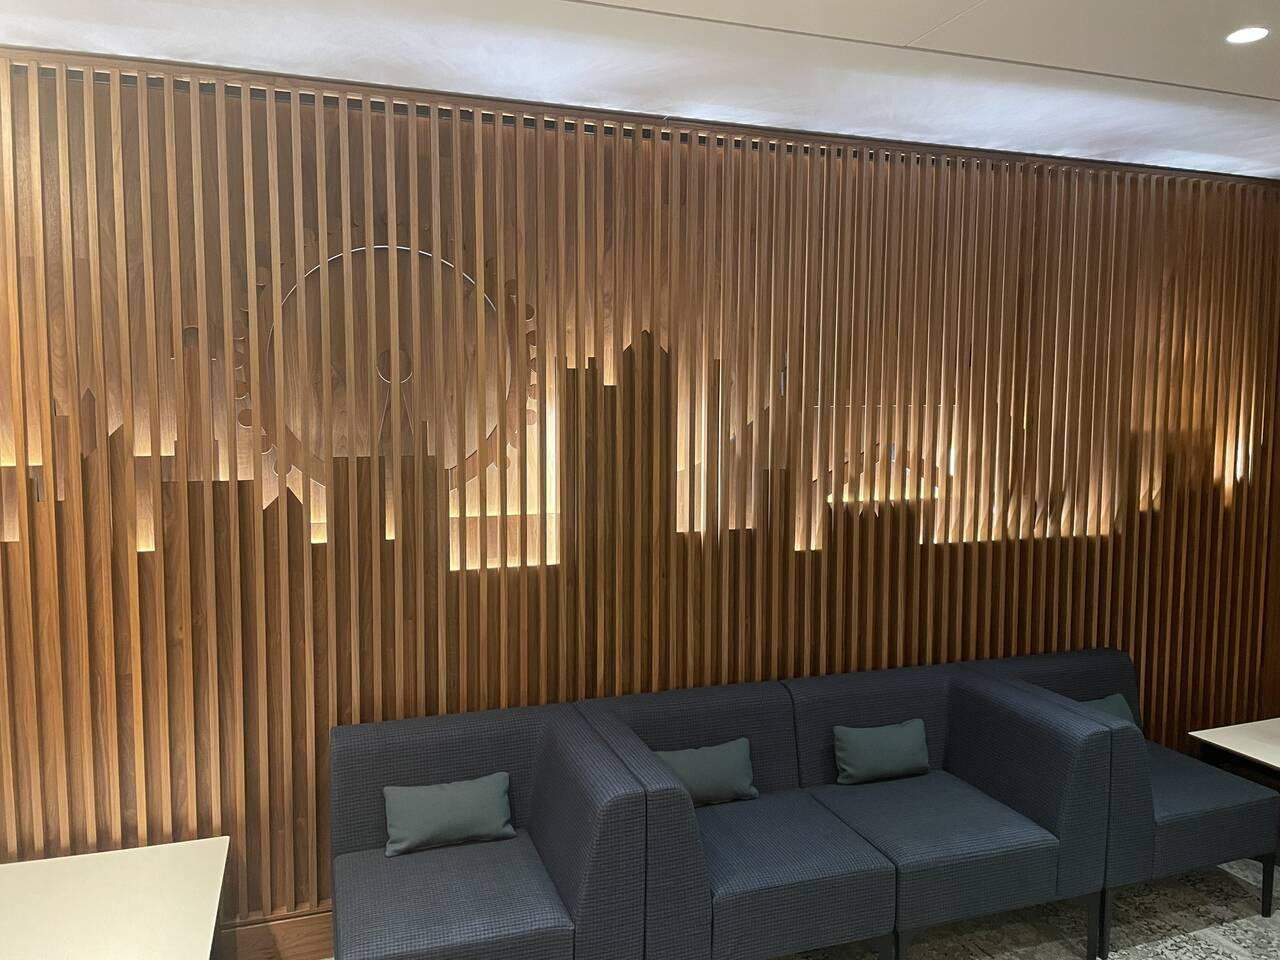 American Express London Heathrow Airport Centurion Lounge